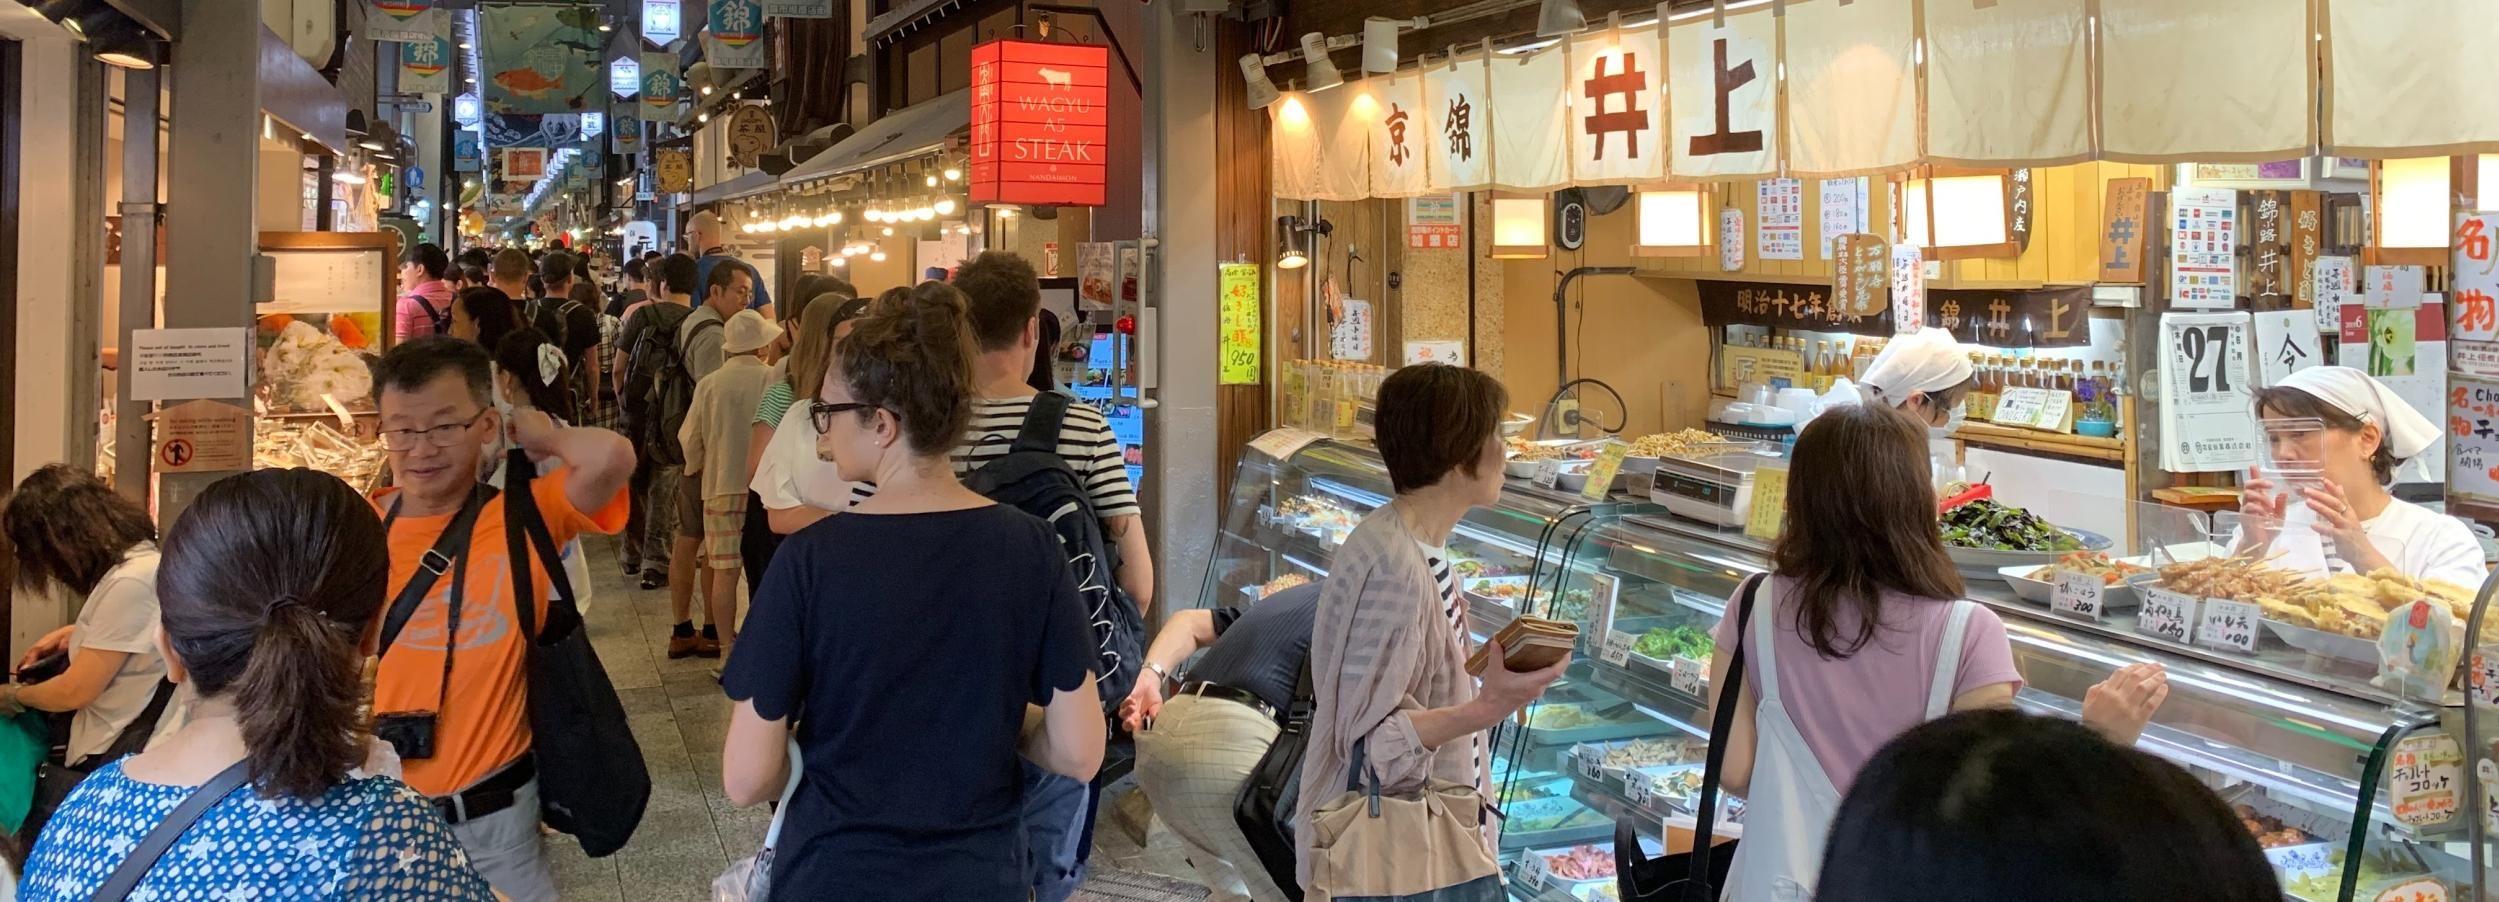 Kyoto: Kulturell-kulinarischer Rundgang Nishiki-Markt & Gion